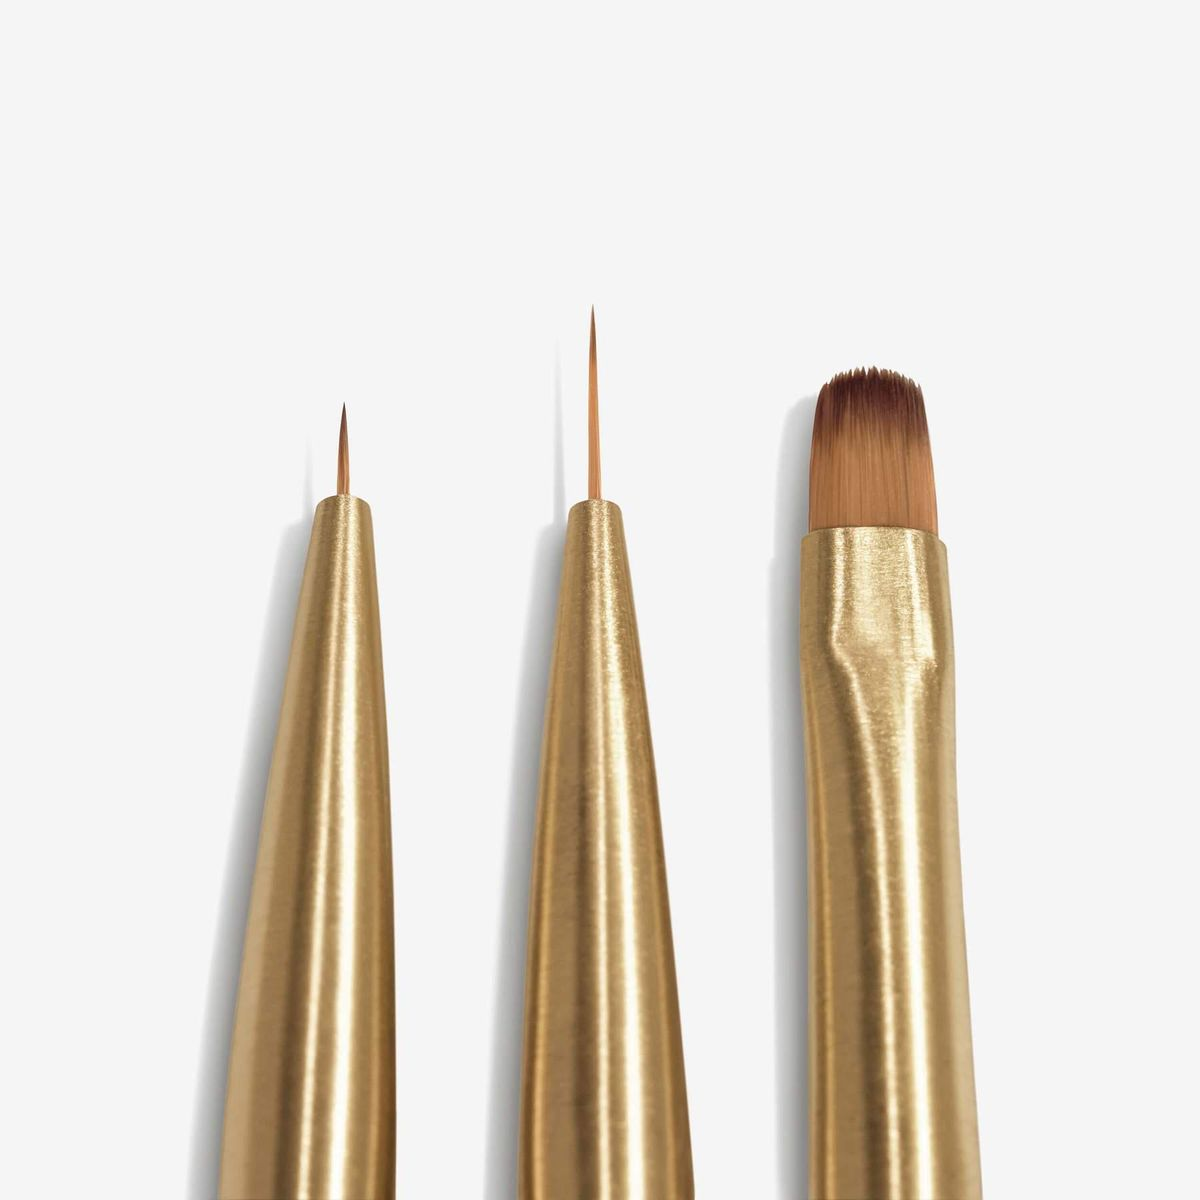 doublemoss arte primero brush set